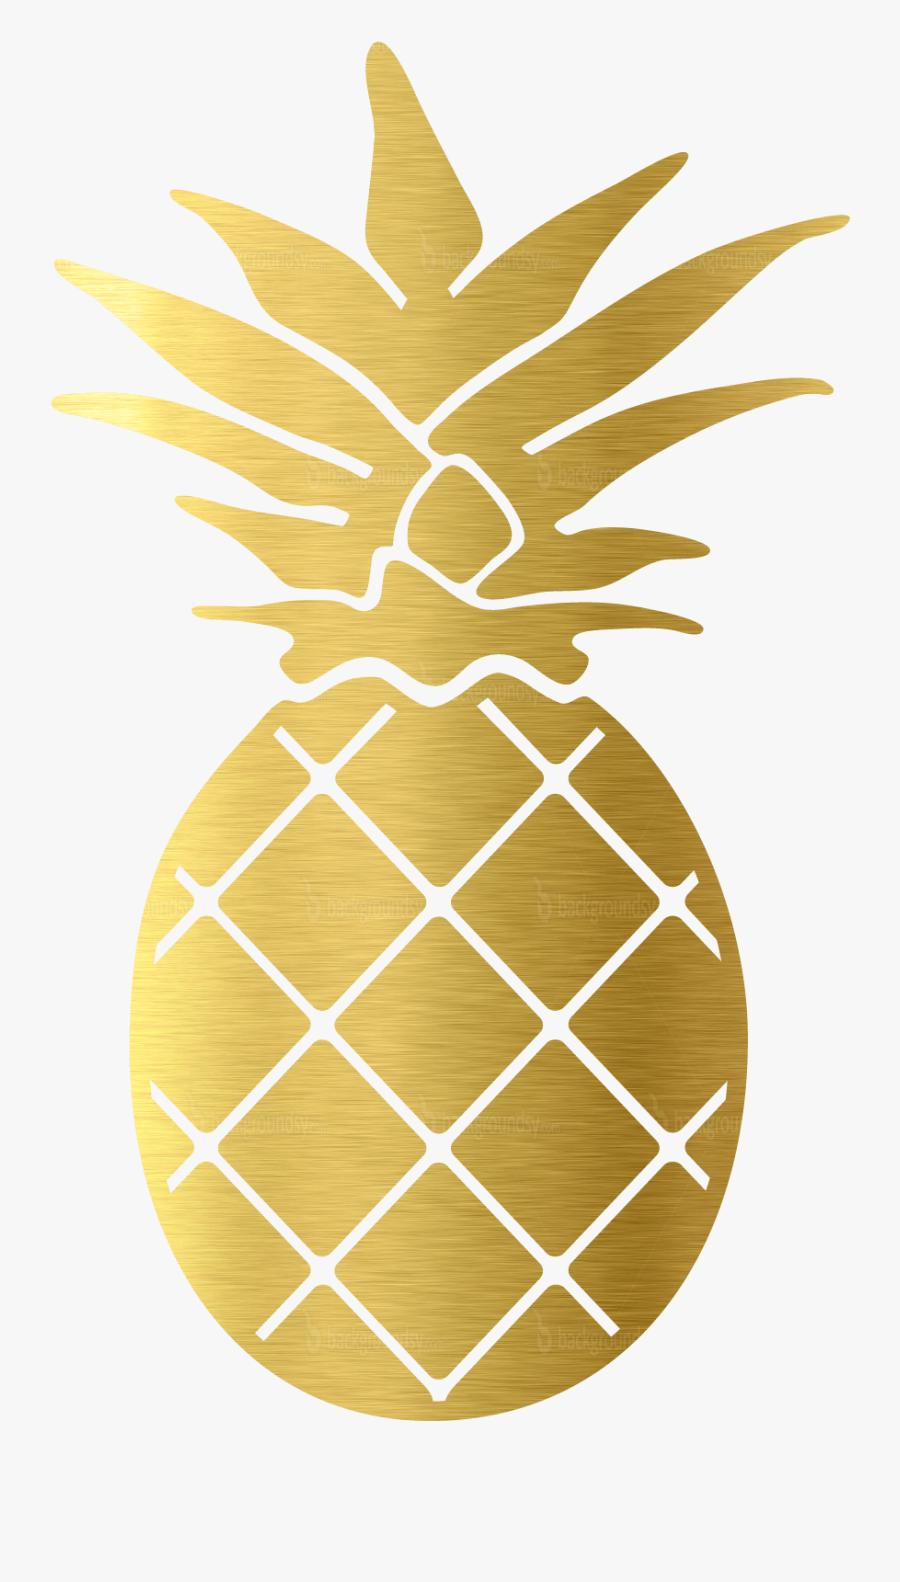 Clip Art Pineapple Gold - Gold Pineapple Clip Art, Transparent Clipart